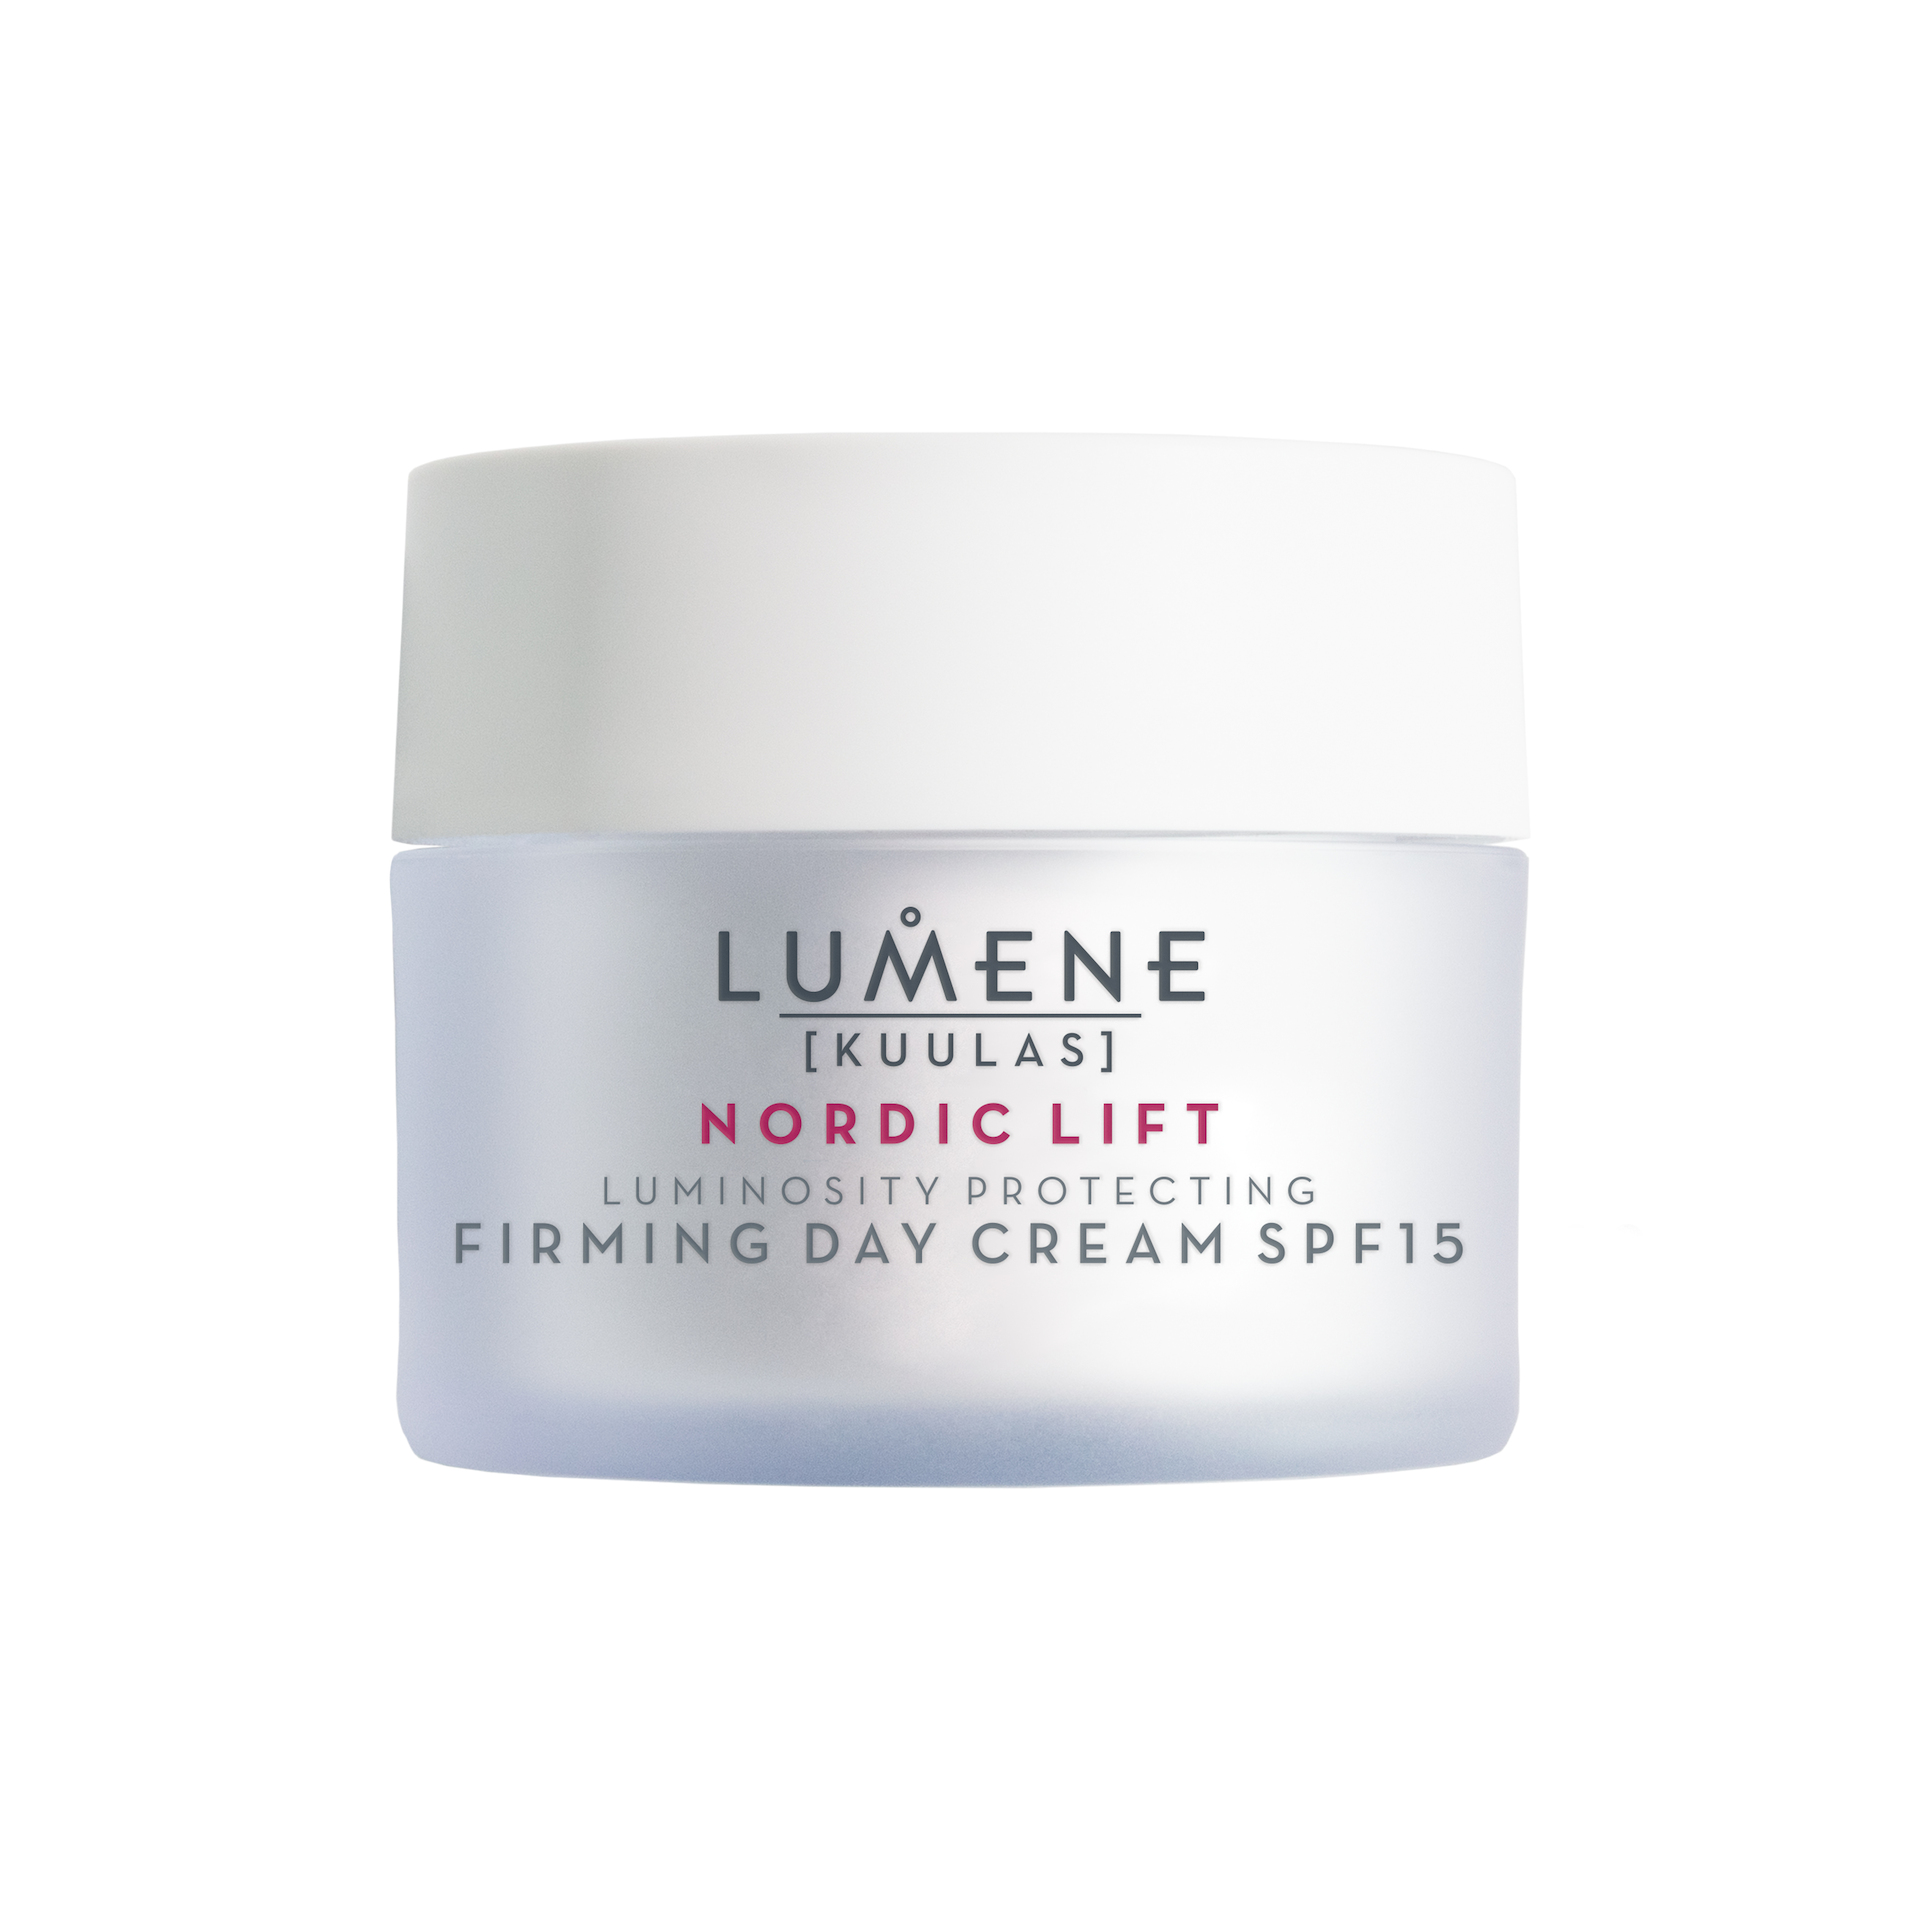 Kuulas NORDIC LIFT Luminosity Protecting Firming Day Cream SPF15 50ml